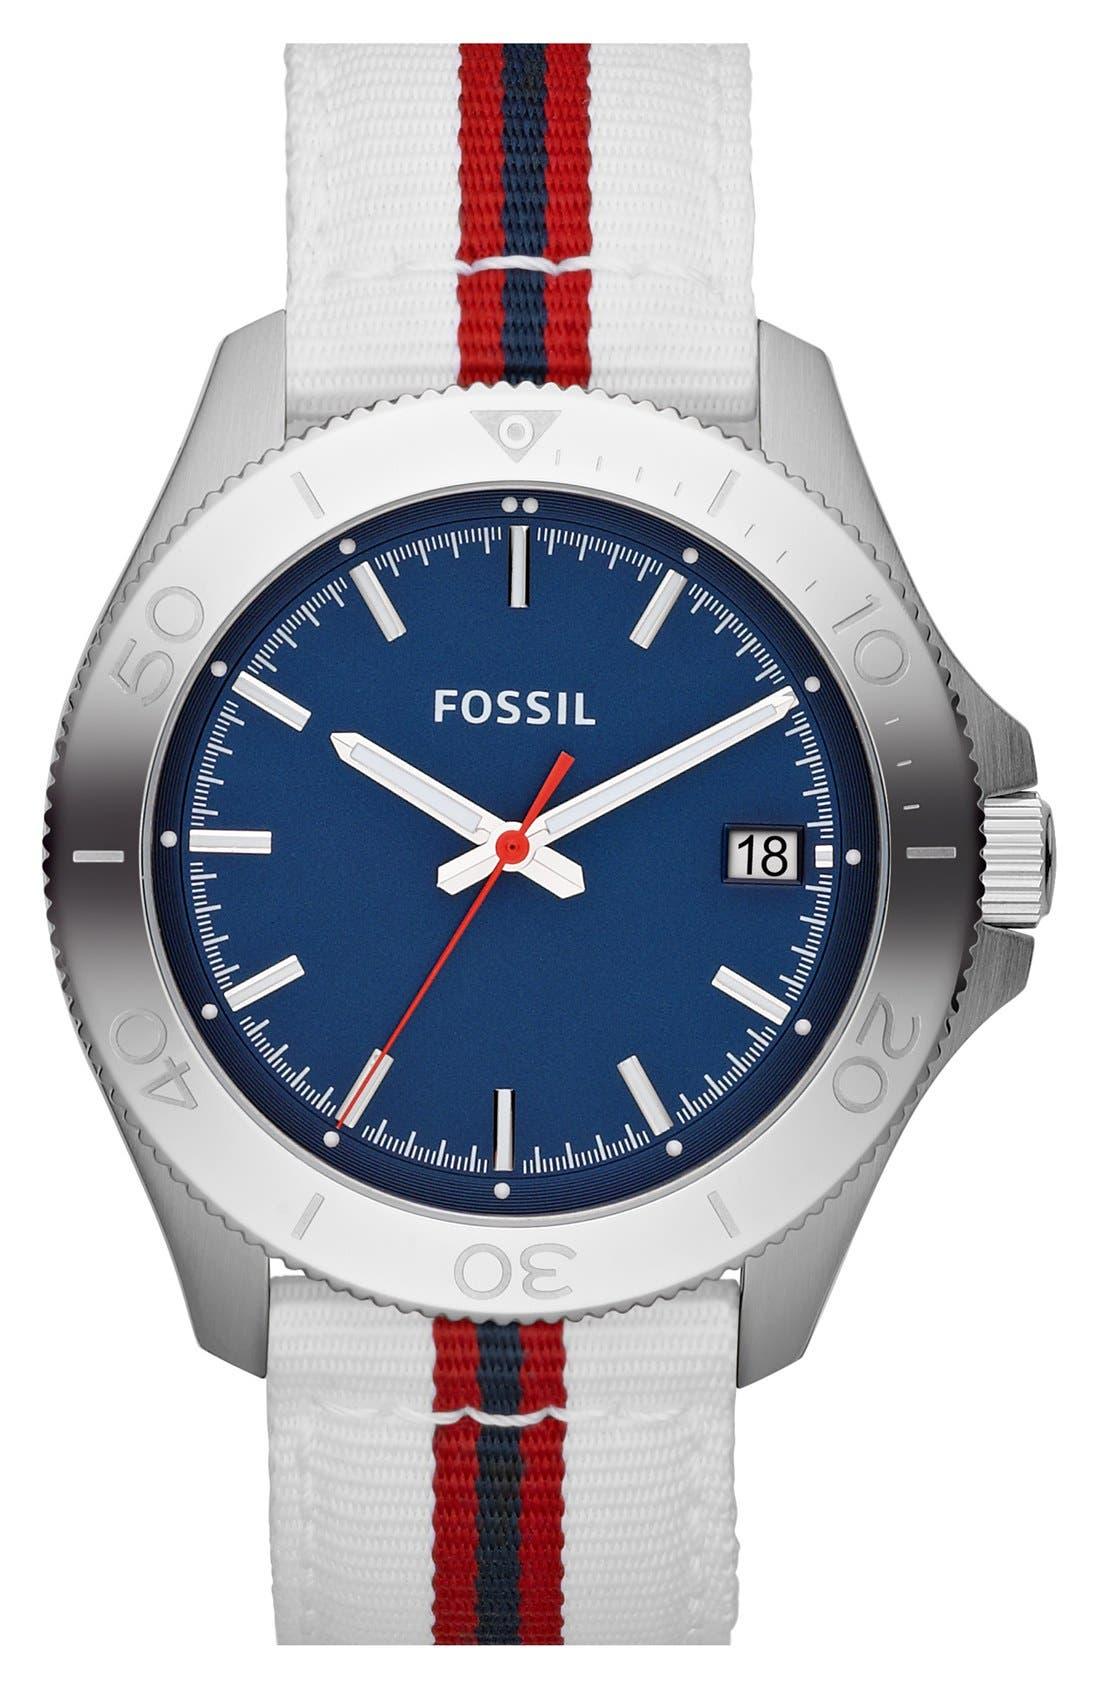 FOSSIL 'Retro Traveler' Nylon Strap Watch, 44mm, Main, color, 100